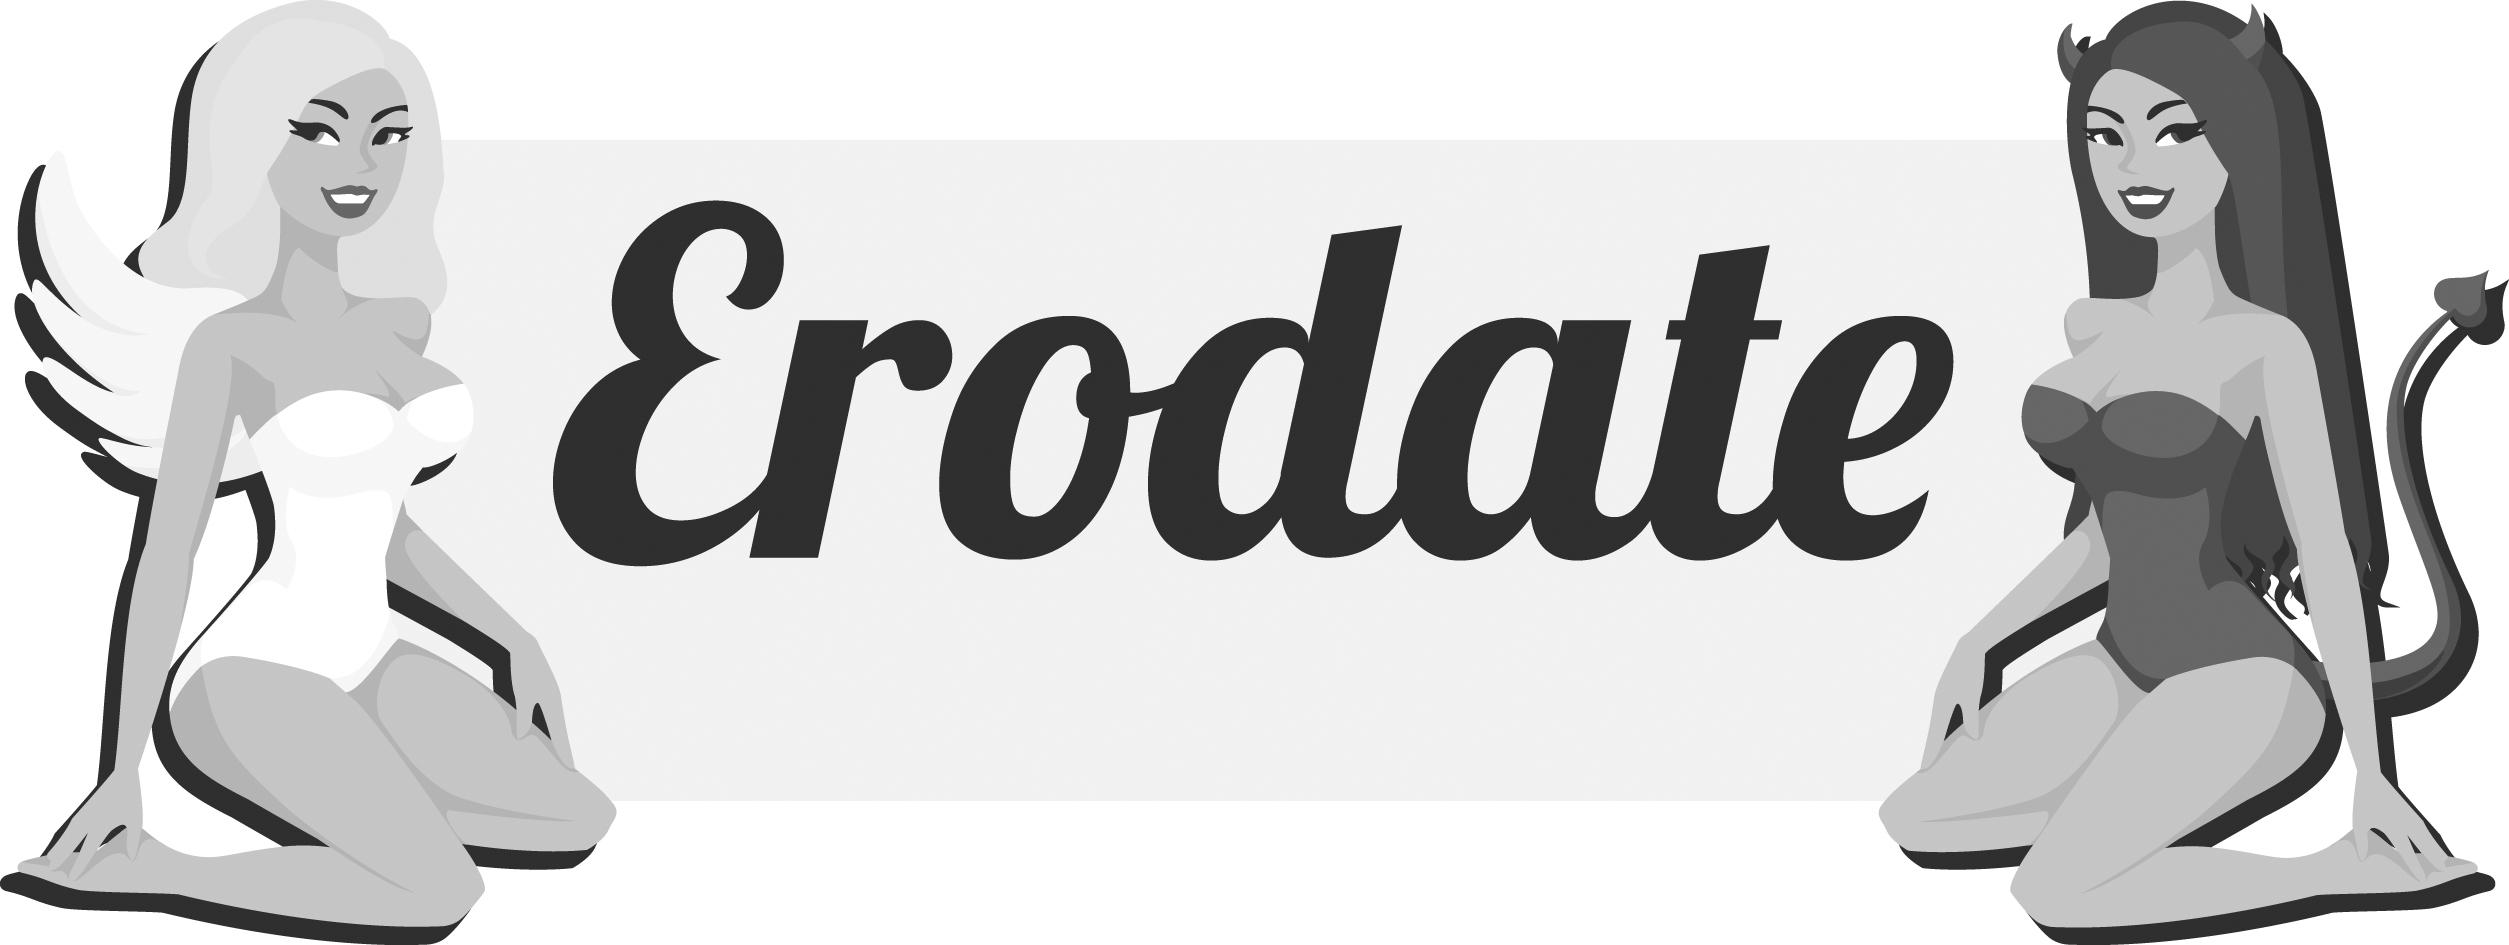 Wort-/Bildmarke: Erodate